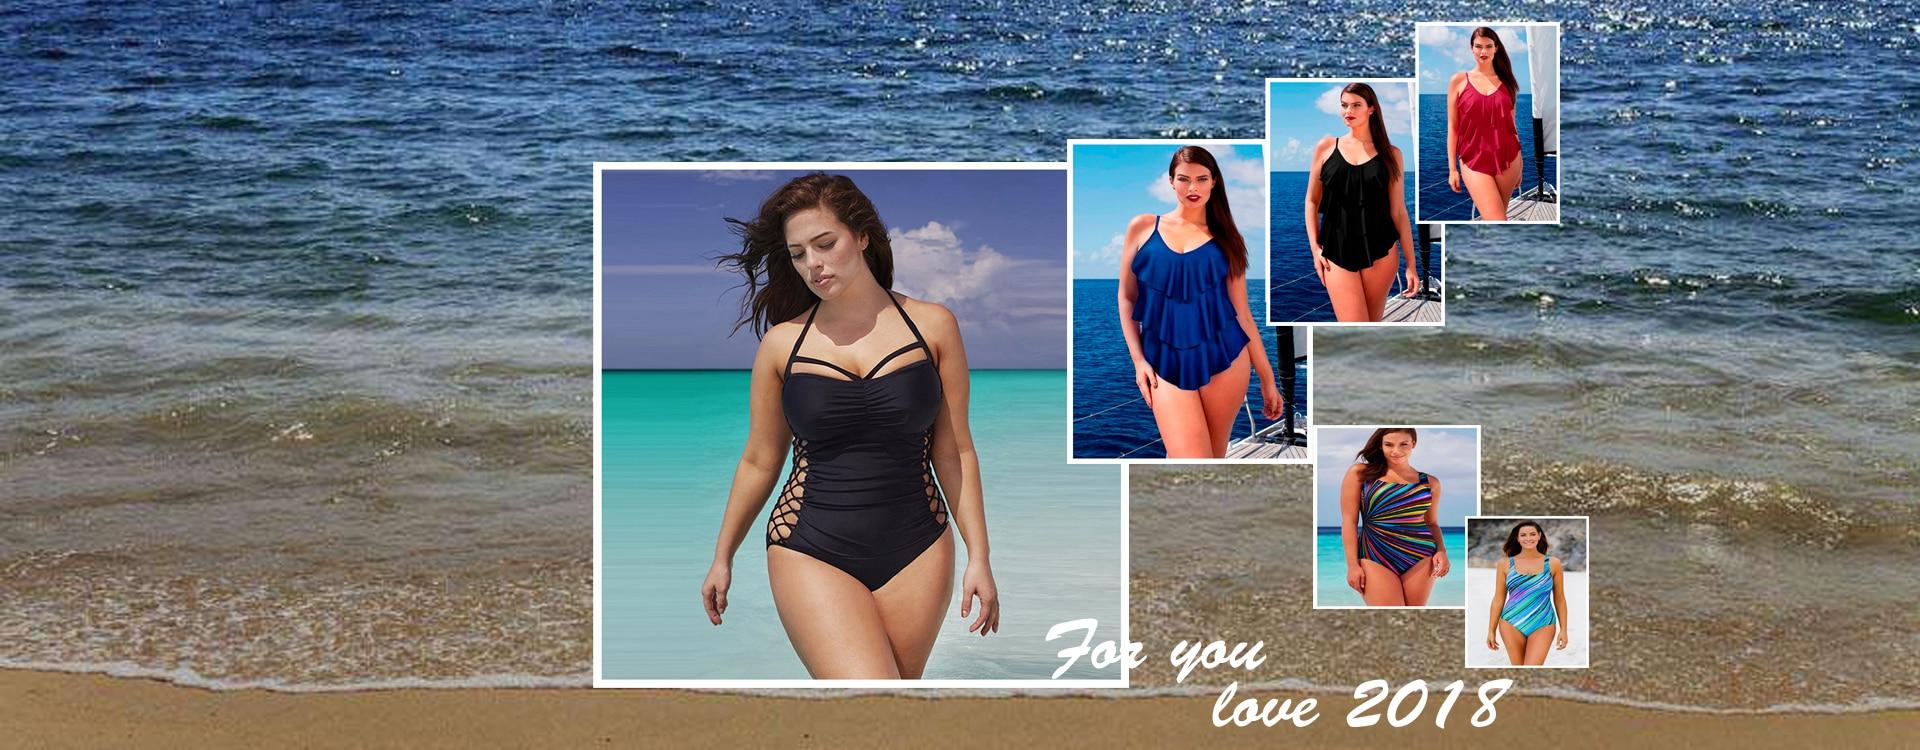 68b5ce86db 5XL Large Big Plus Size Swimwear For Women Sexy One Piece Swimsuit 2018  Slimming Female Print Retro Beach Bathing Suit Bodysuit